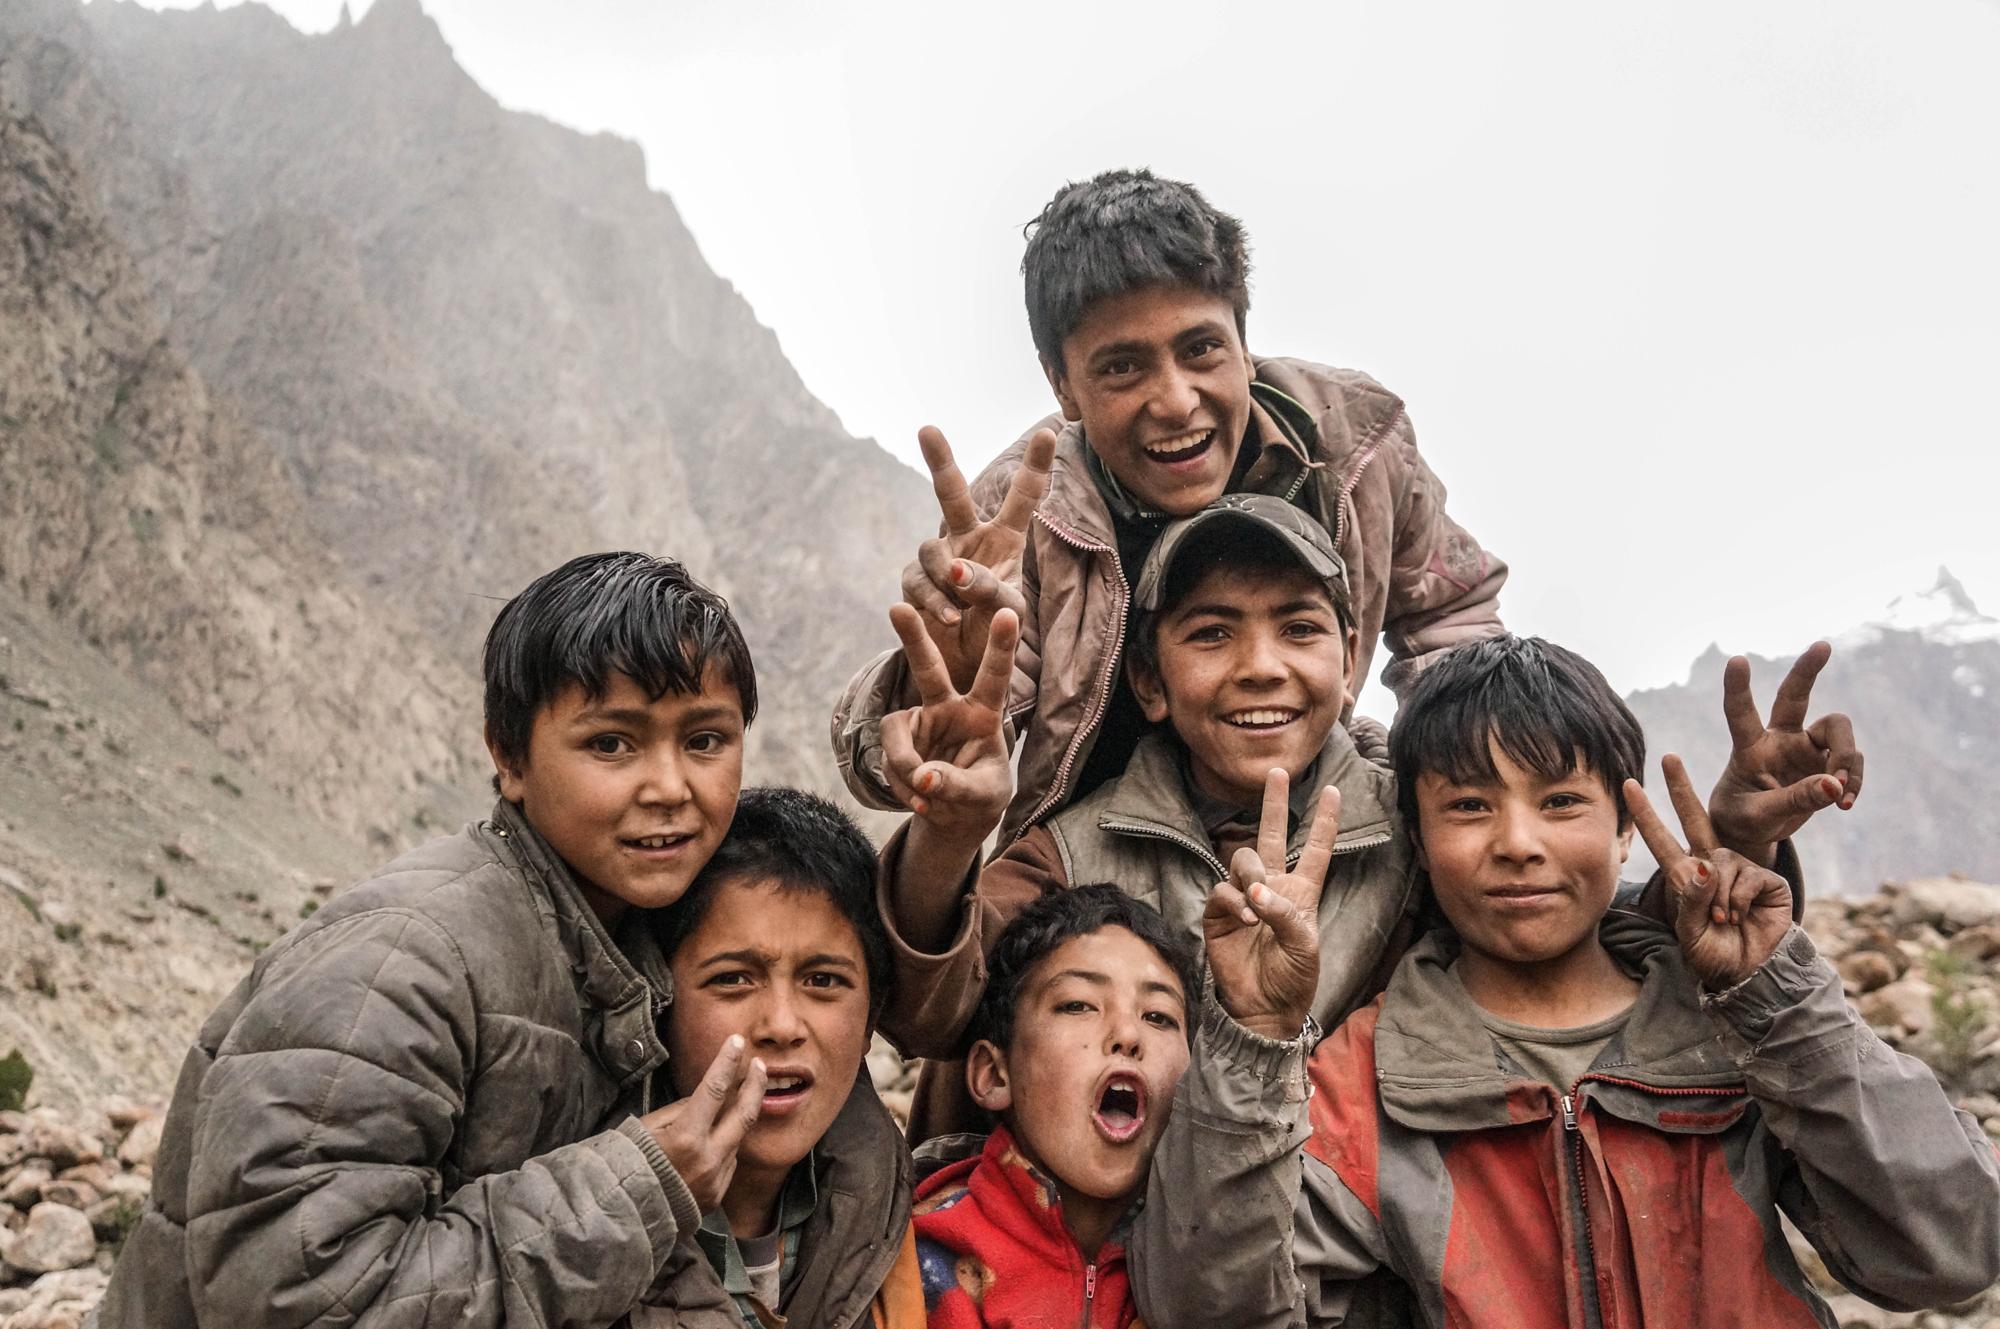 Pakistan expe Karakoram Ragolski Francois Ovcharov Veso Loncar Petar Shams Kids Hushe 2